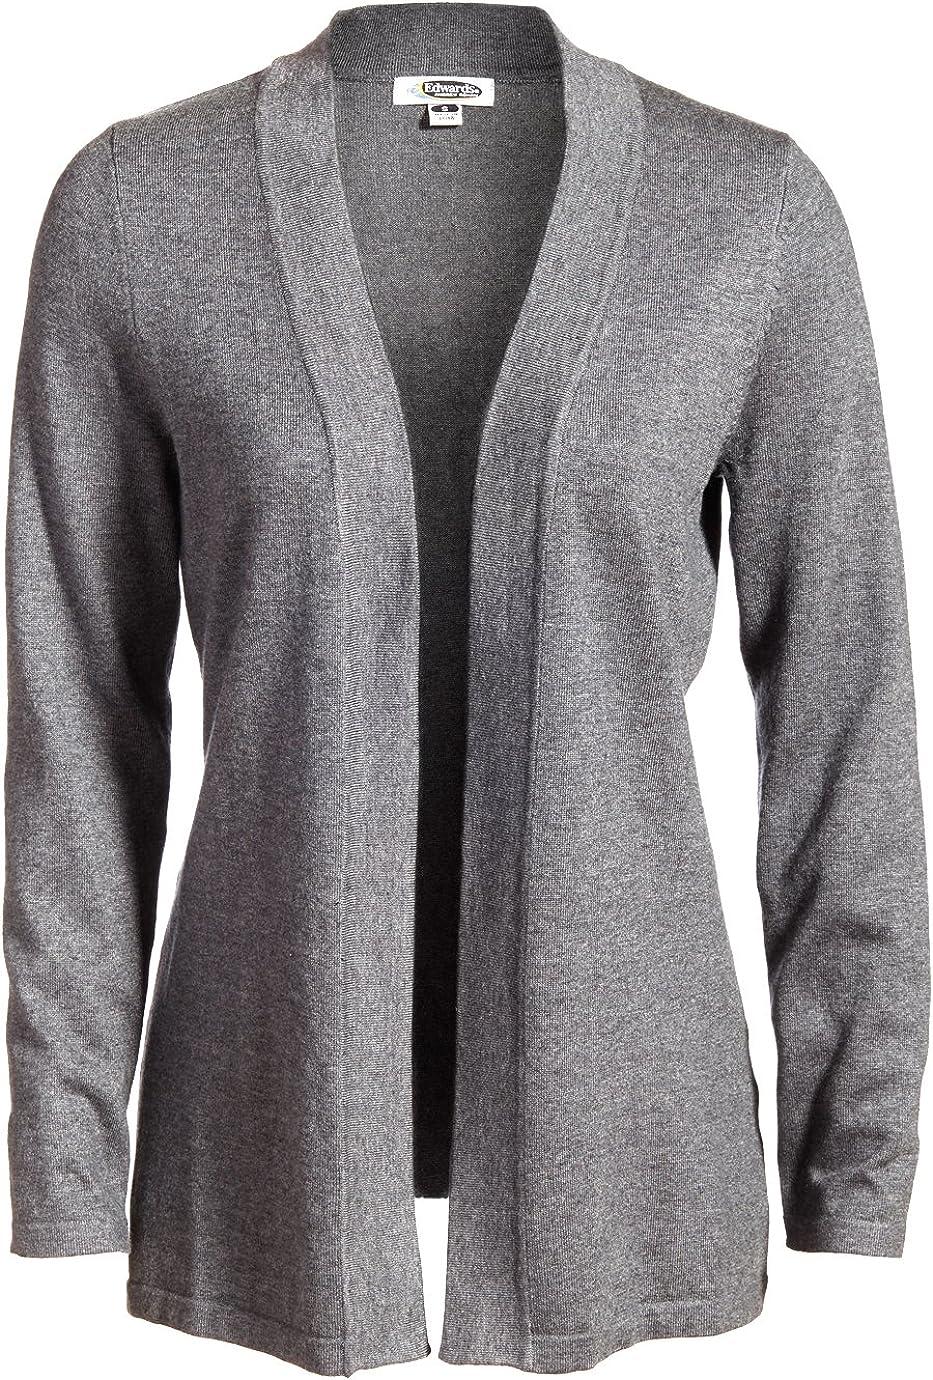 Grey Heather Women's Open Front Cardigan, Size: XS